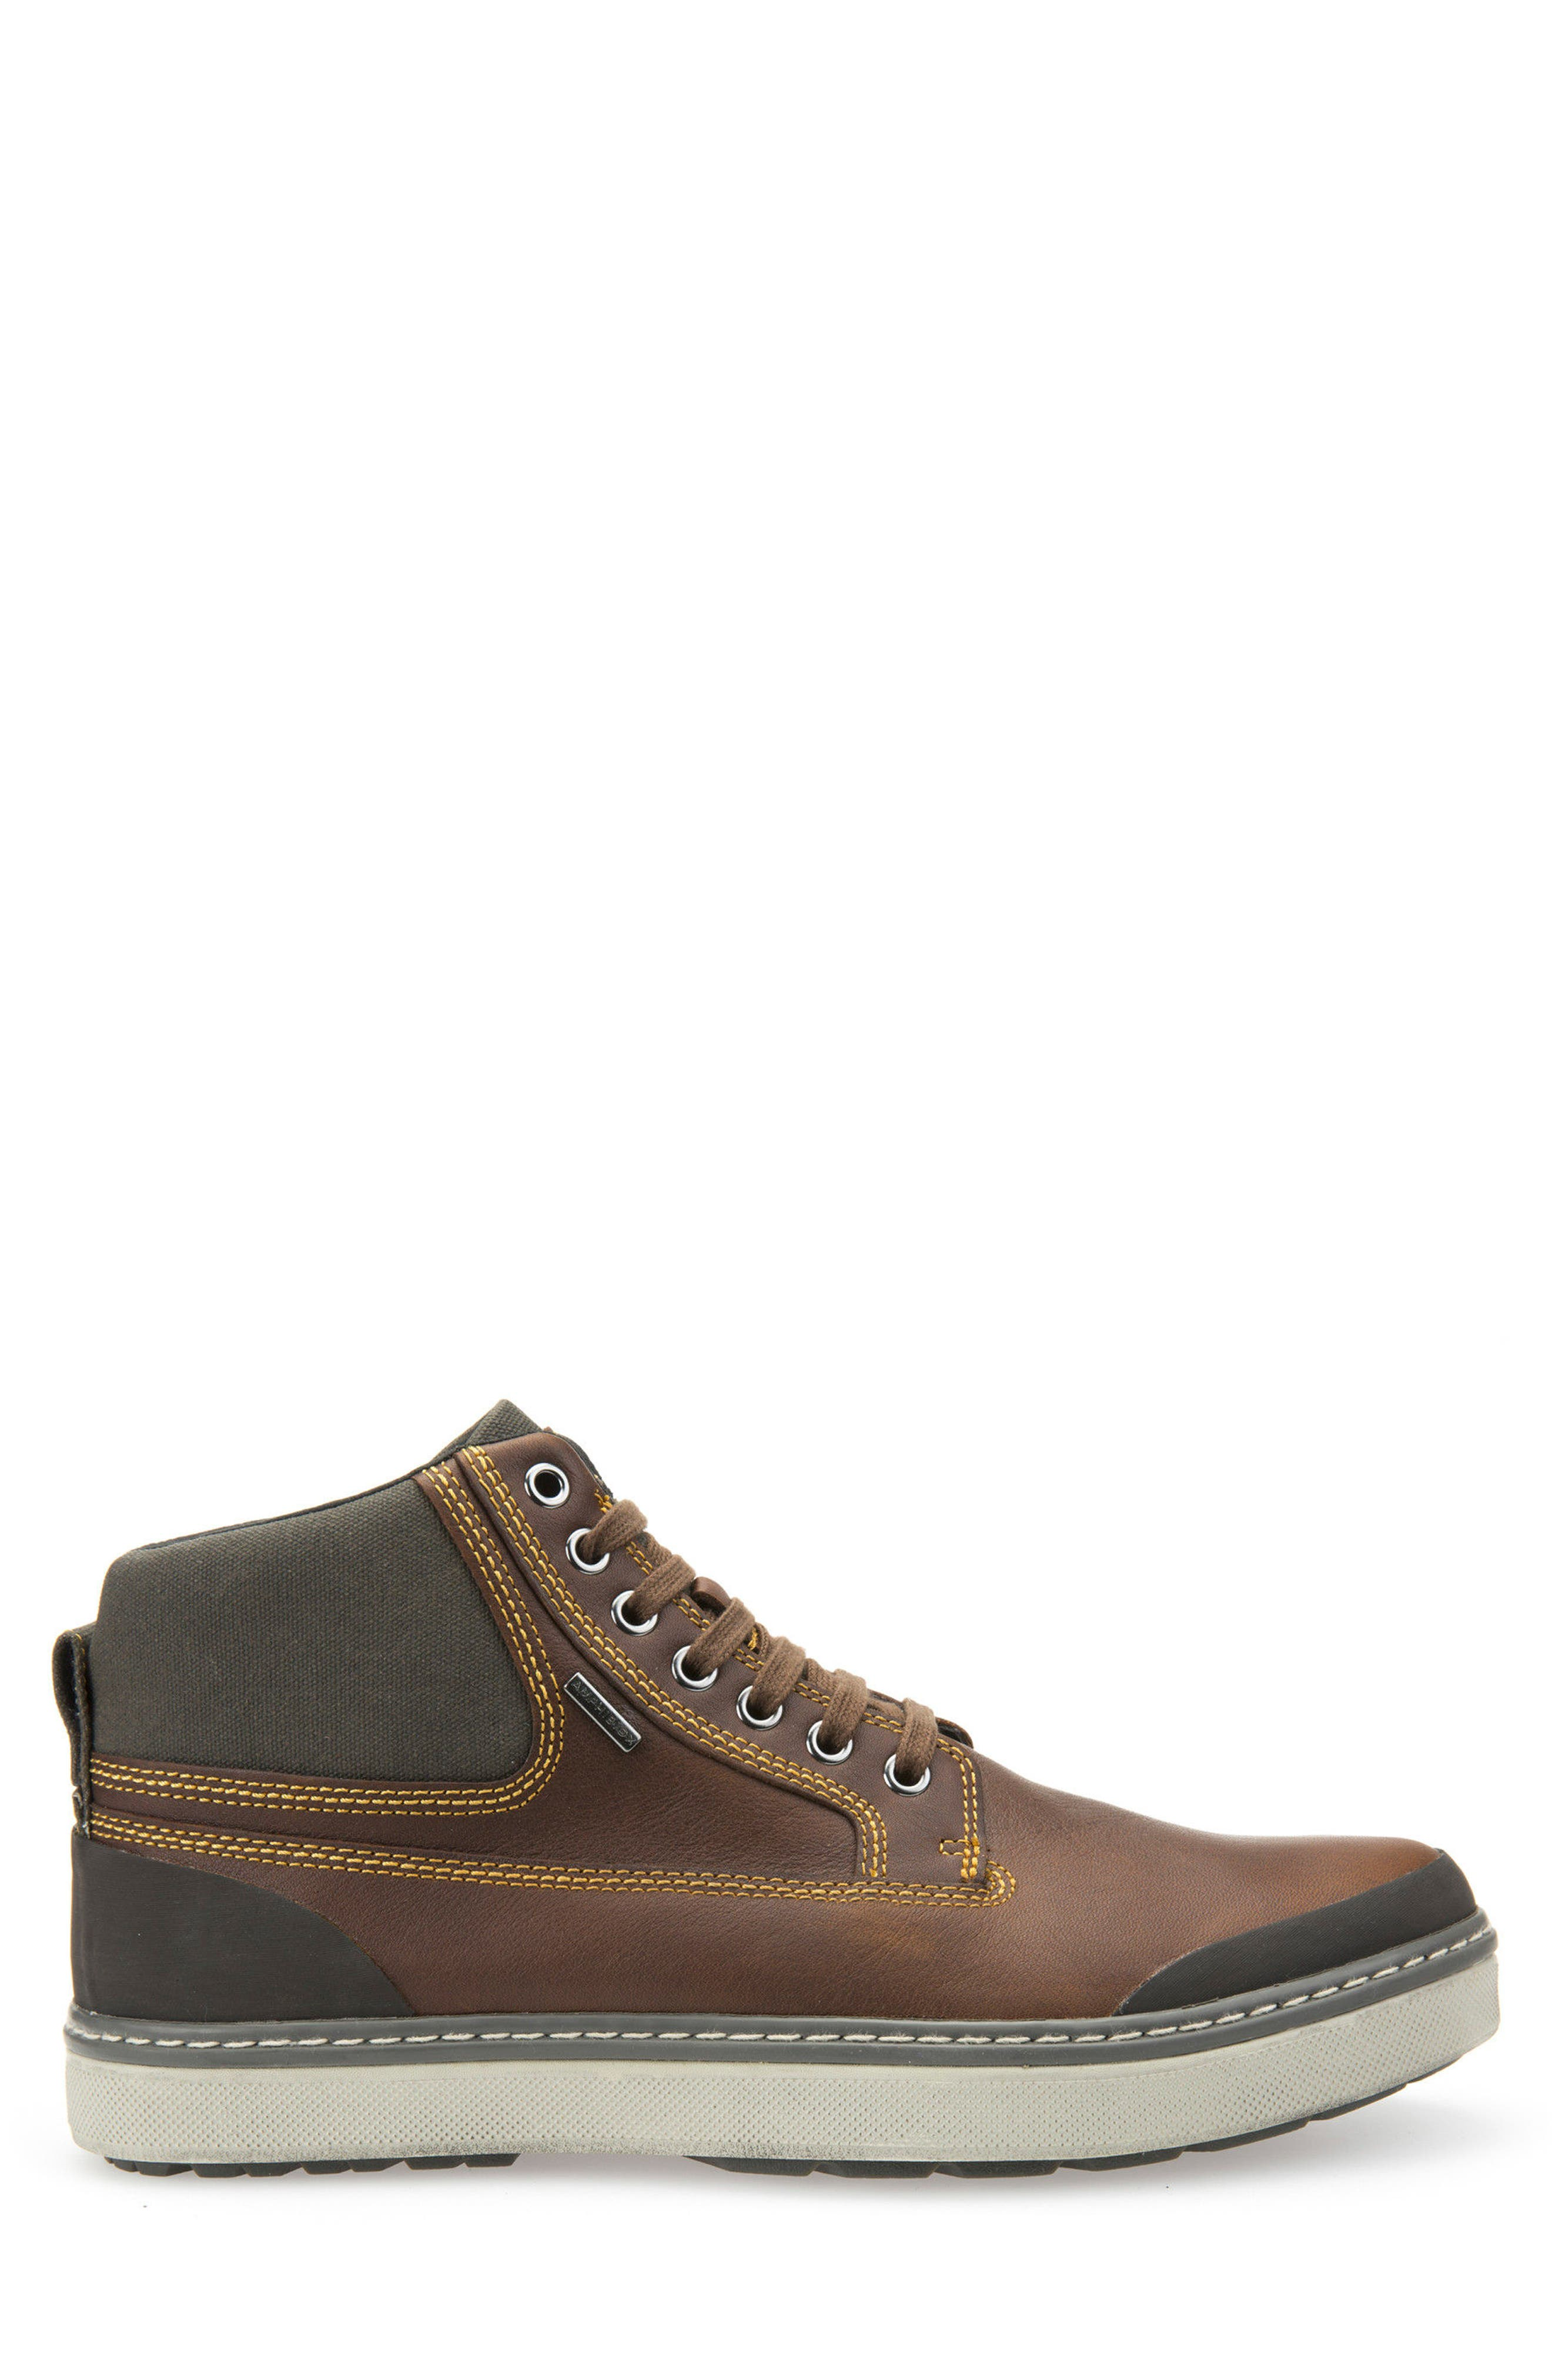 Mattias Amphibiox Waterproof Leather Sneaker,                             Alternate thumbnail 3, color,                             204